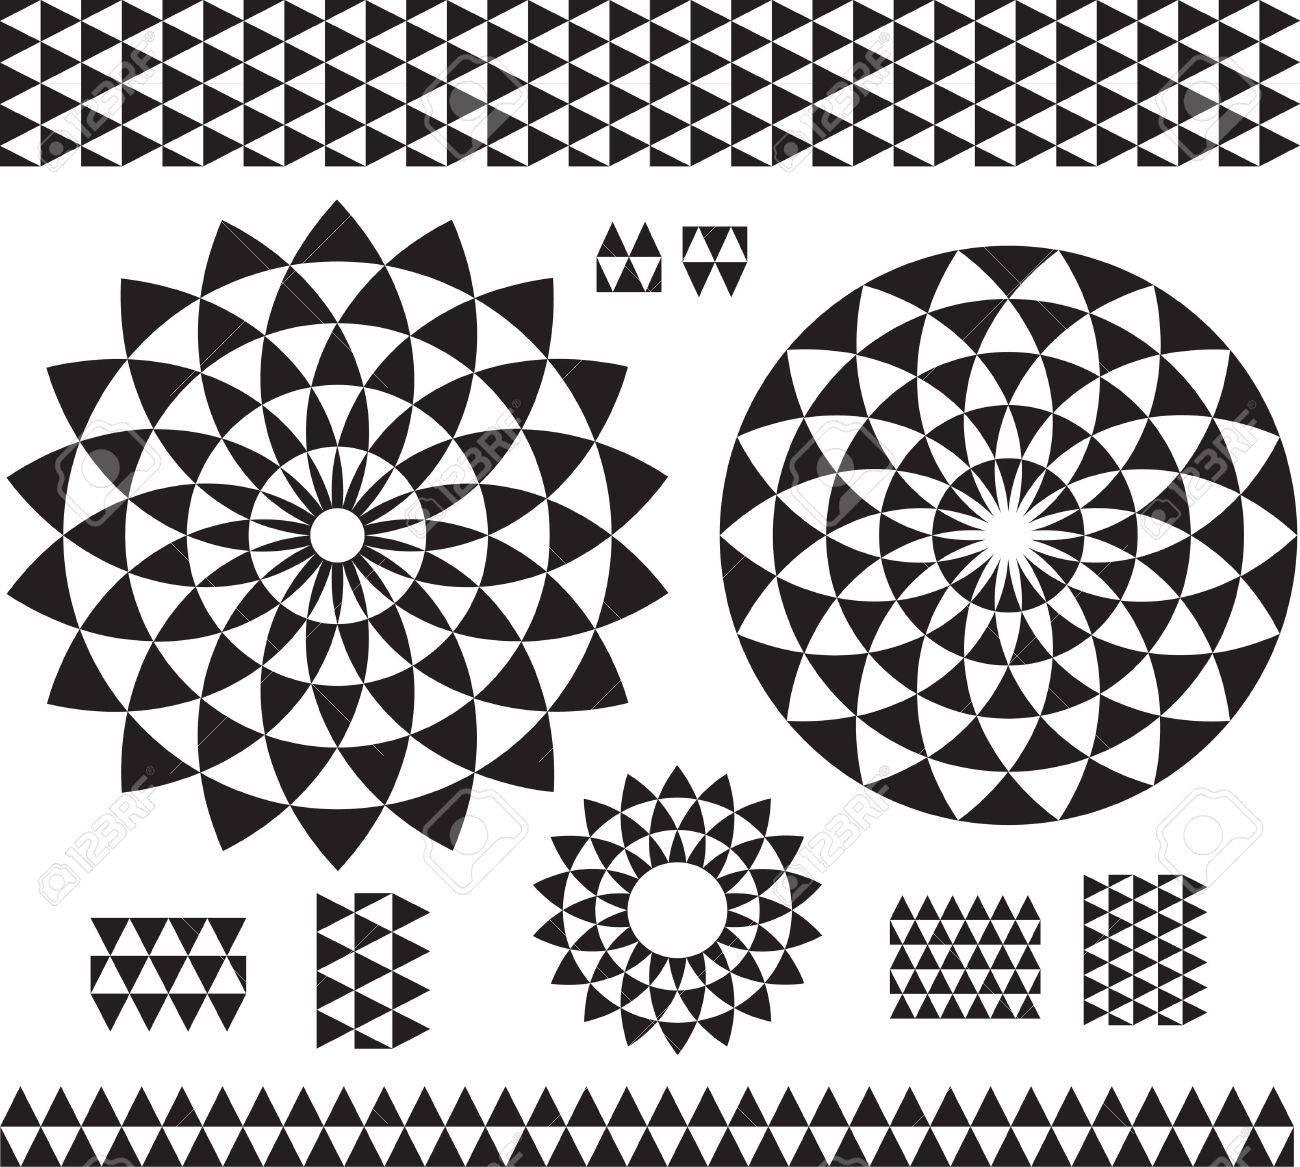 Round Ornament Pattern with pattern brash - 17833834